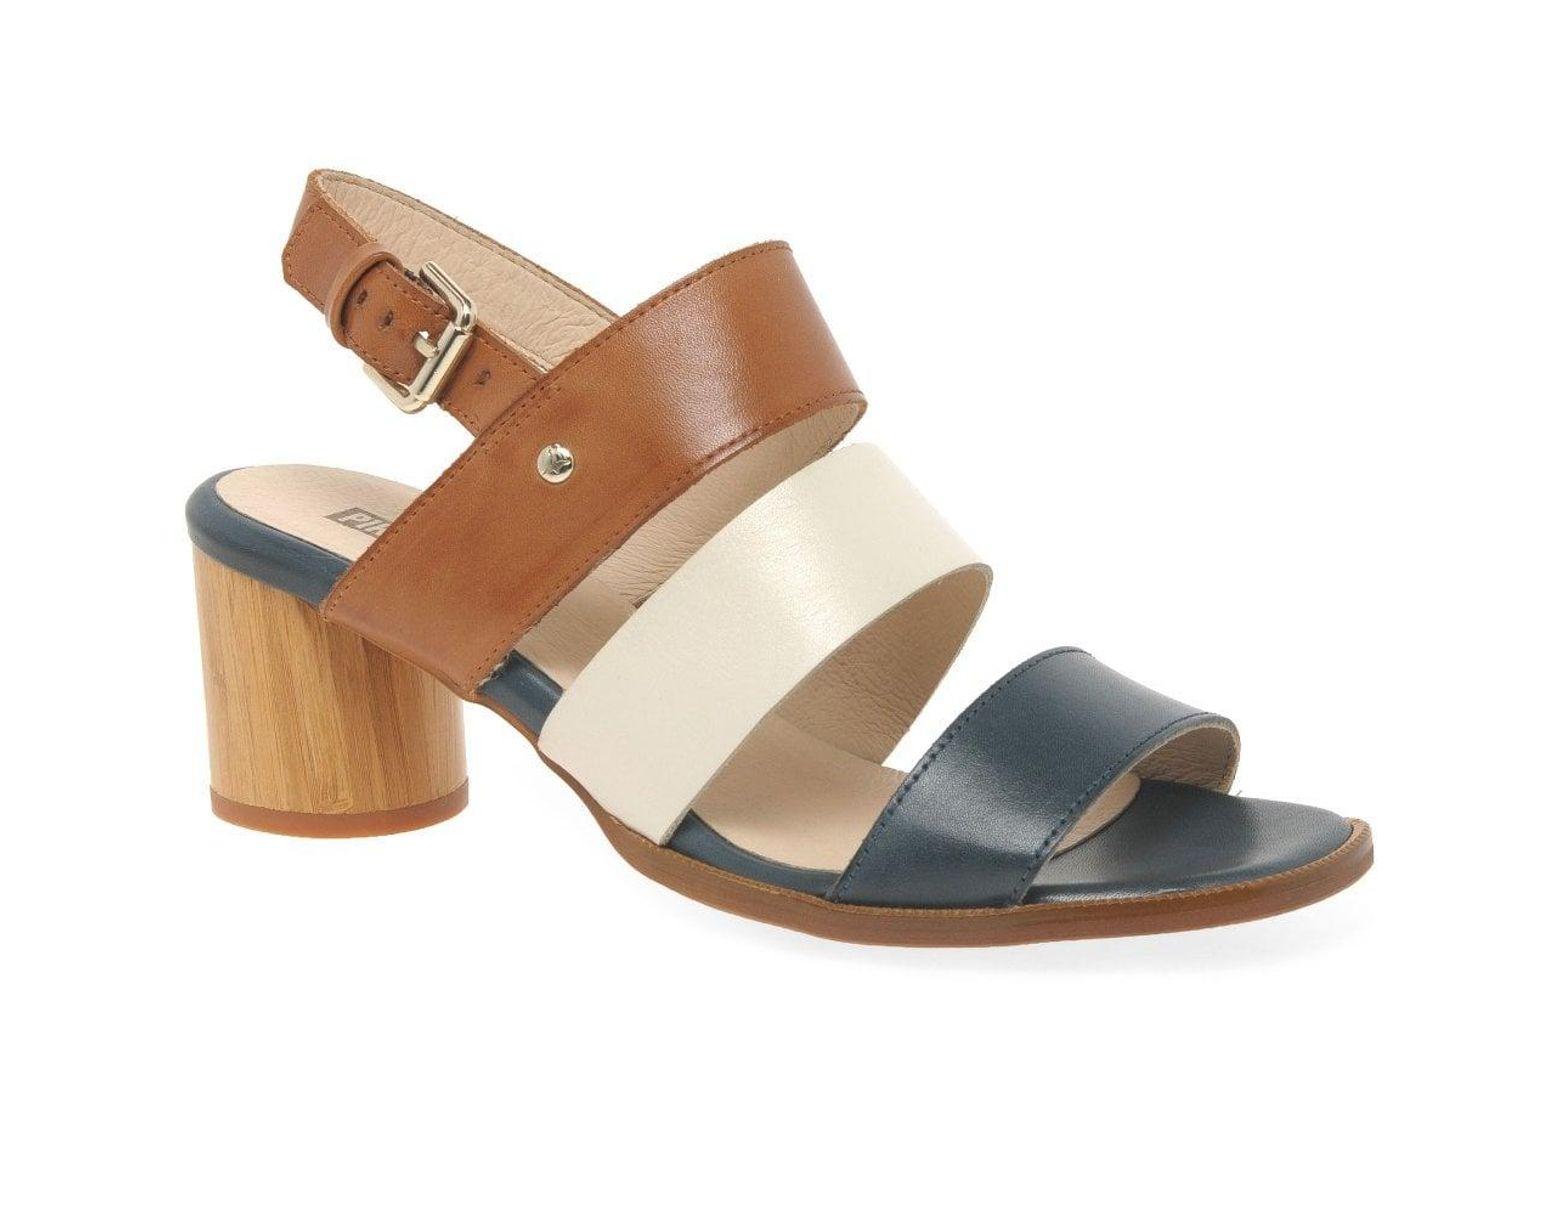 f426330cf3c1a Pikolinos Rota Womens Block Heel Sandals - Lyst